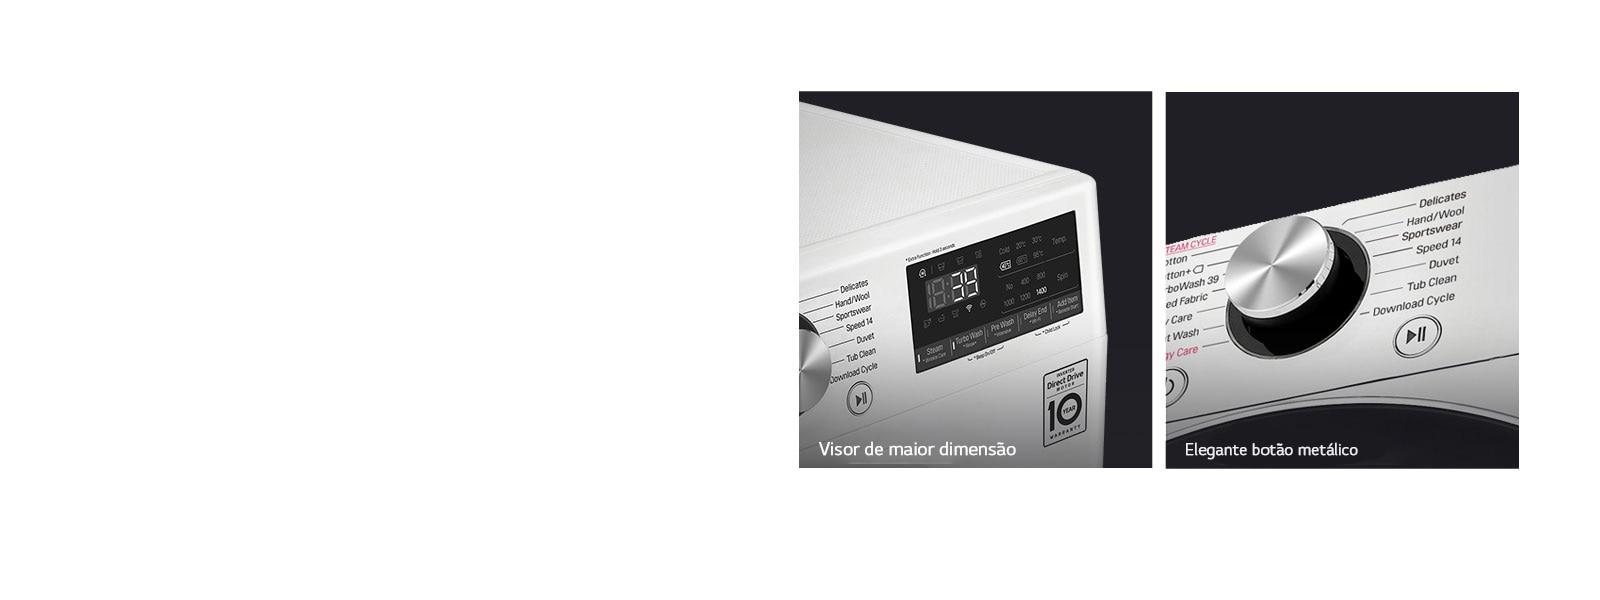 D12_WM-Vivace-V900-VC2-White-11-Design-Desktop_v